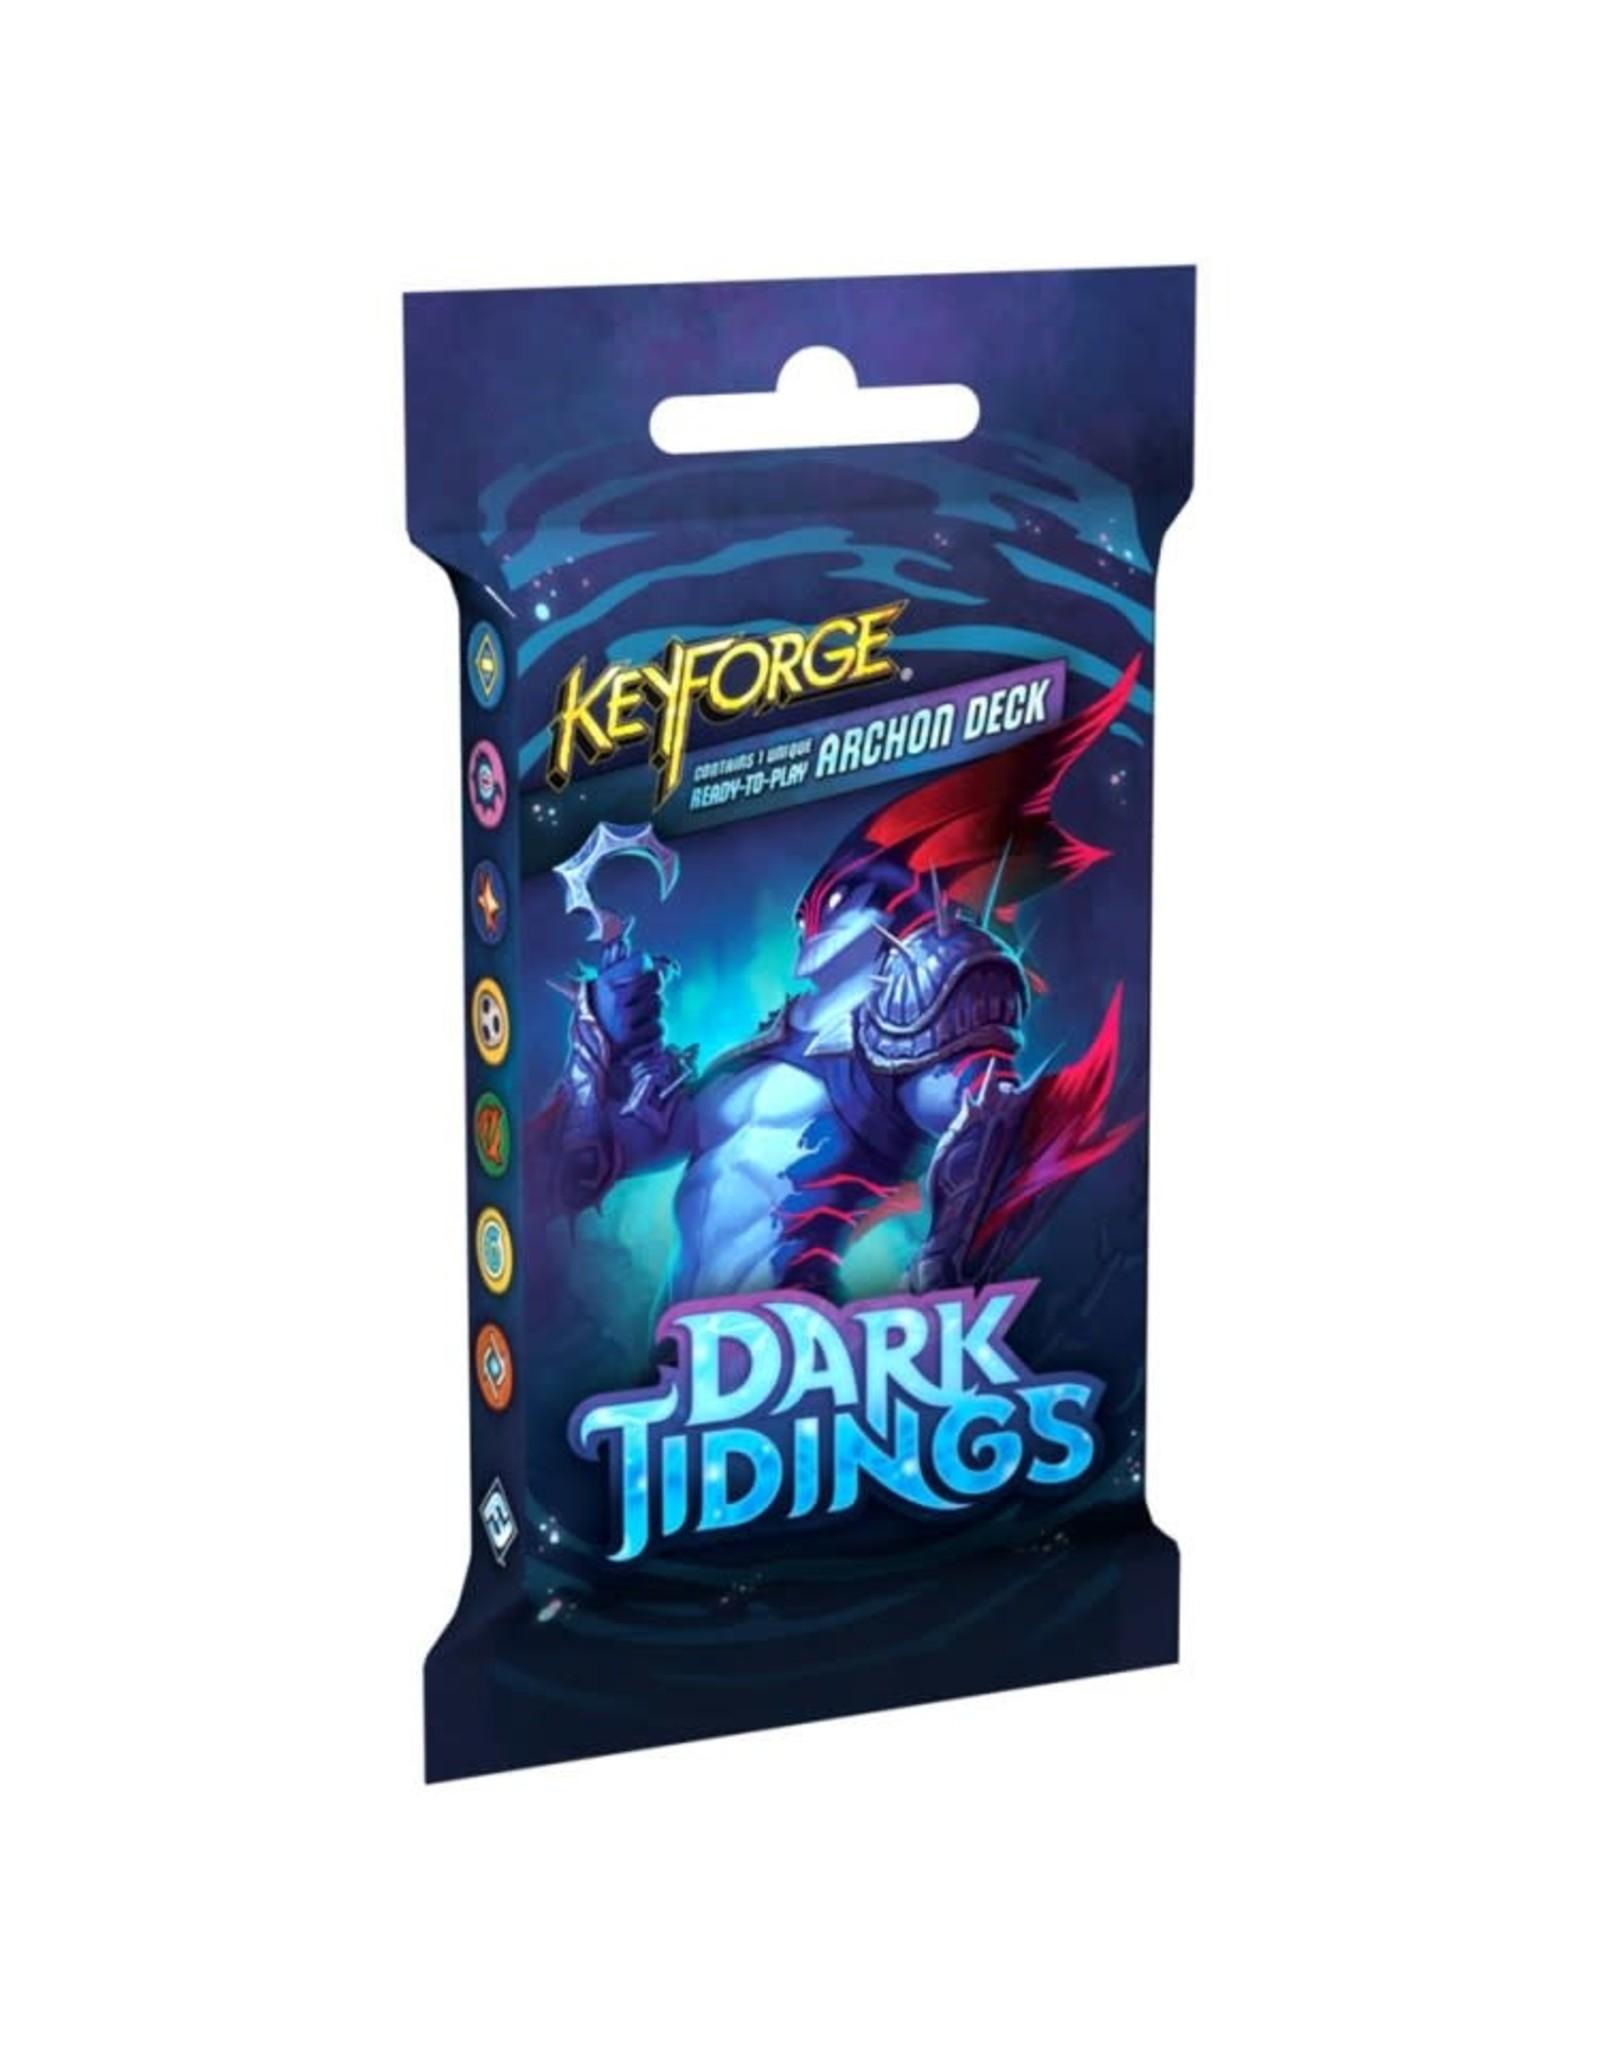 (Pre-Order) KeyForge: Dark Tidings: Archon Deck Display